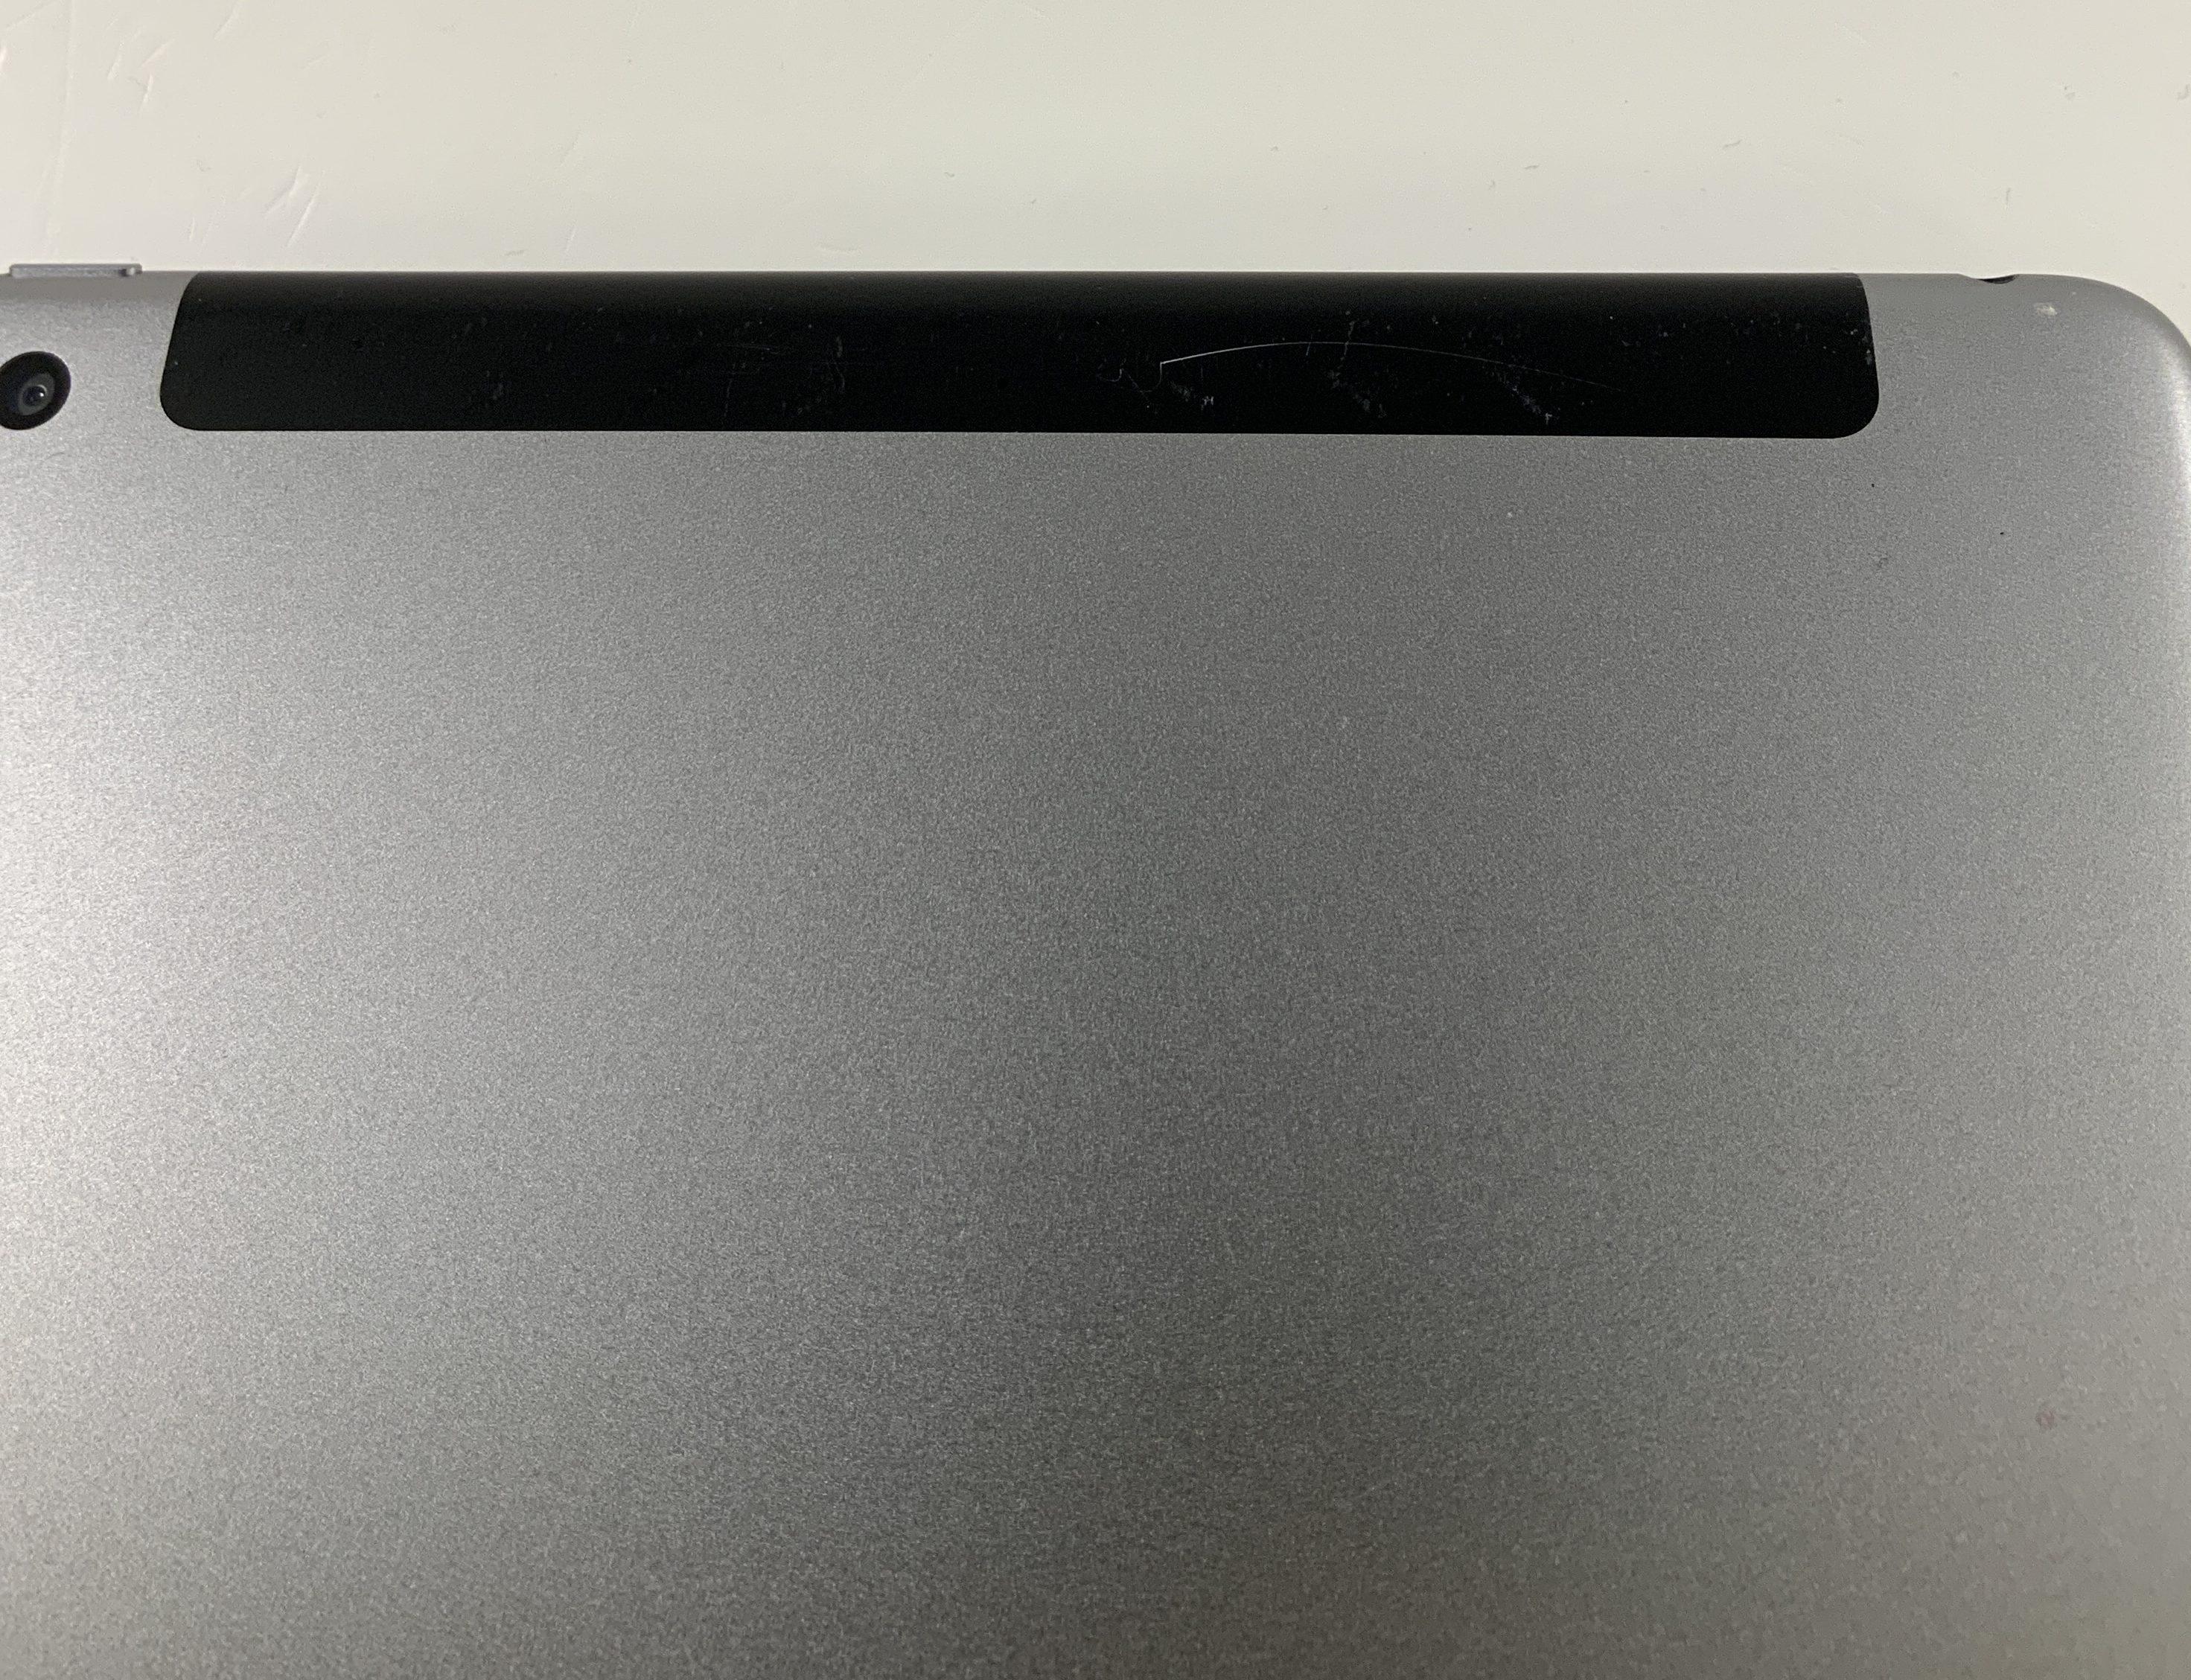 iPad 5 Wi-Fi + Cellular 128GB, 128GB, Space Gray, imagen 4